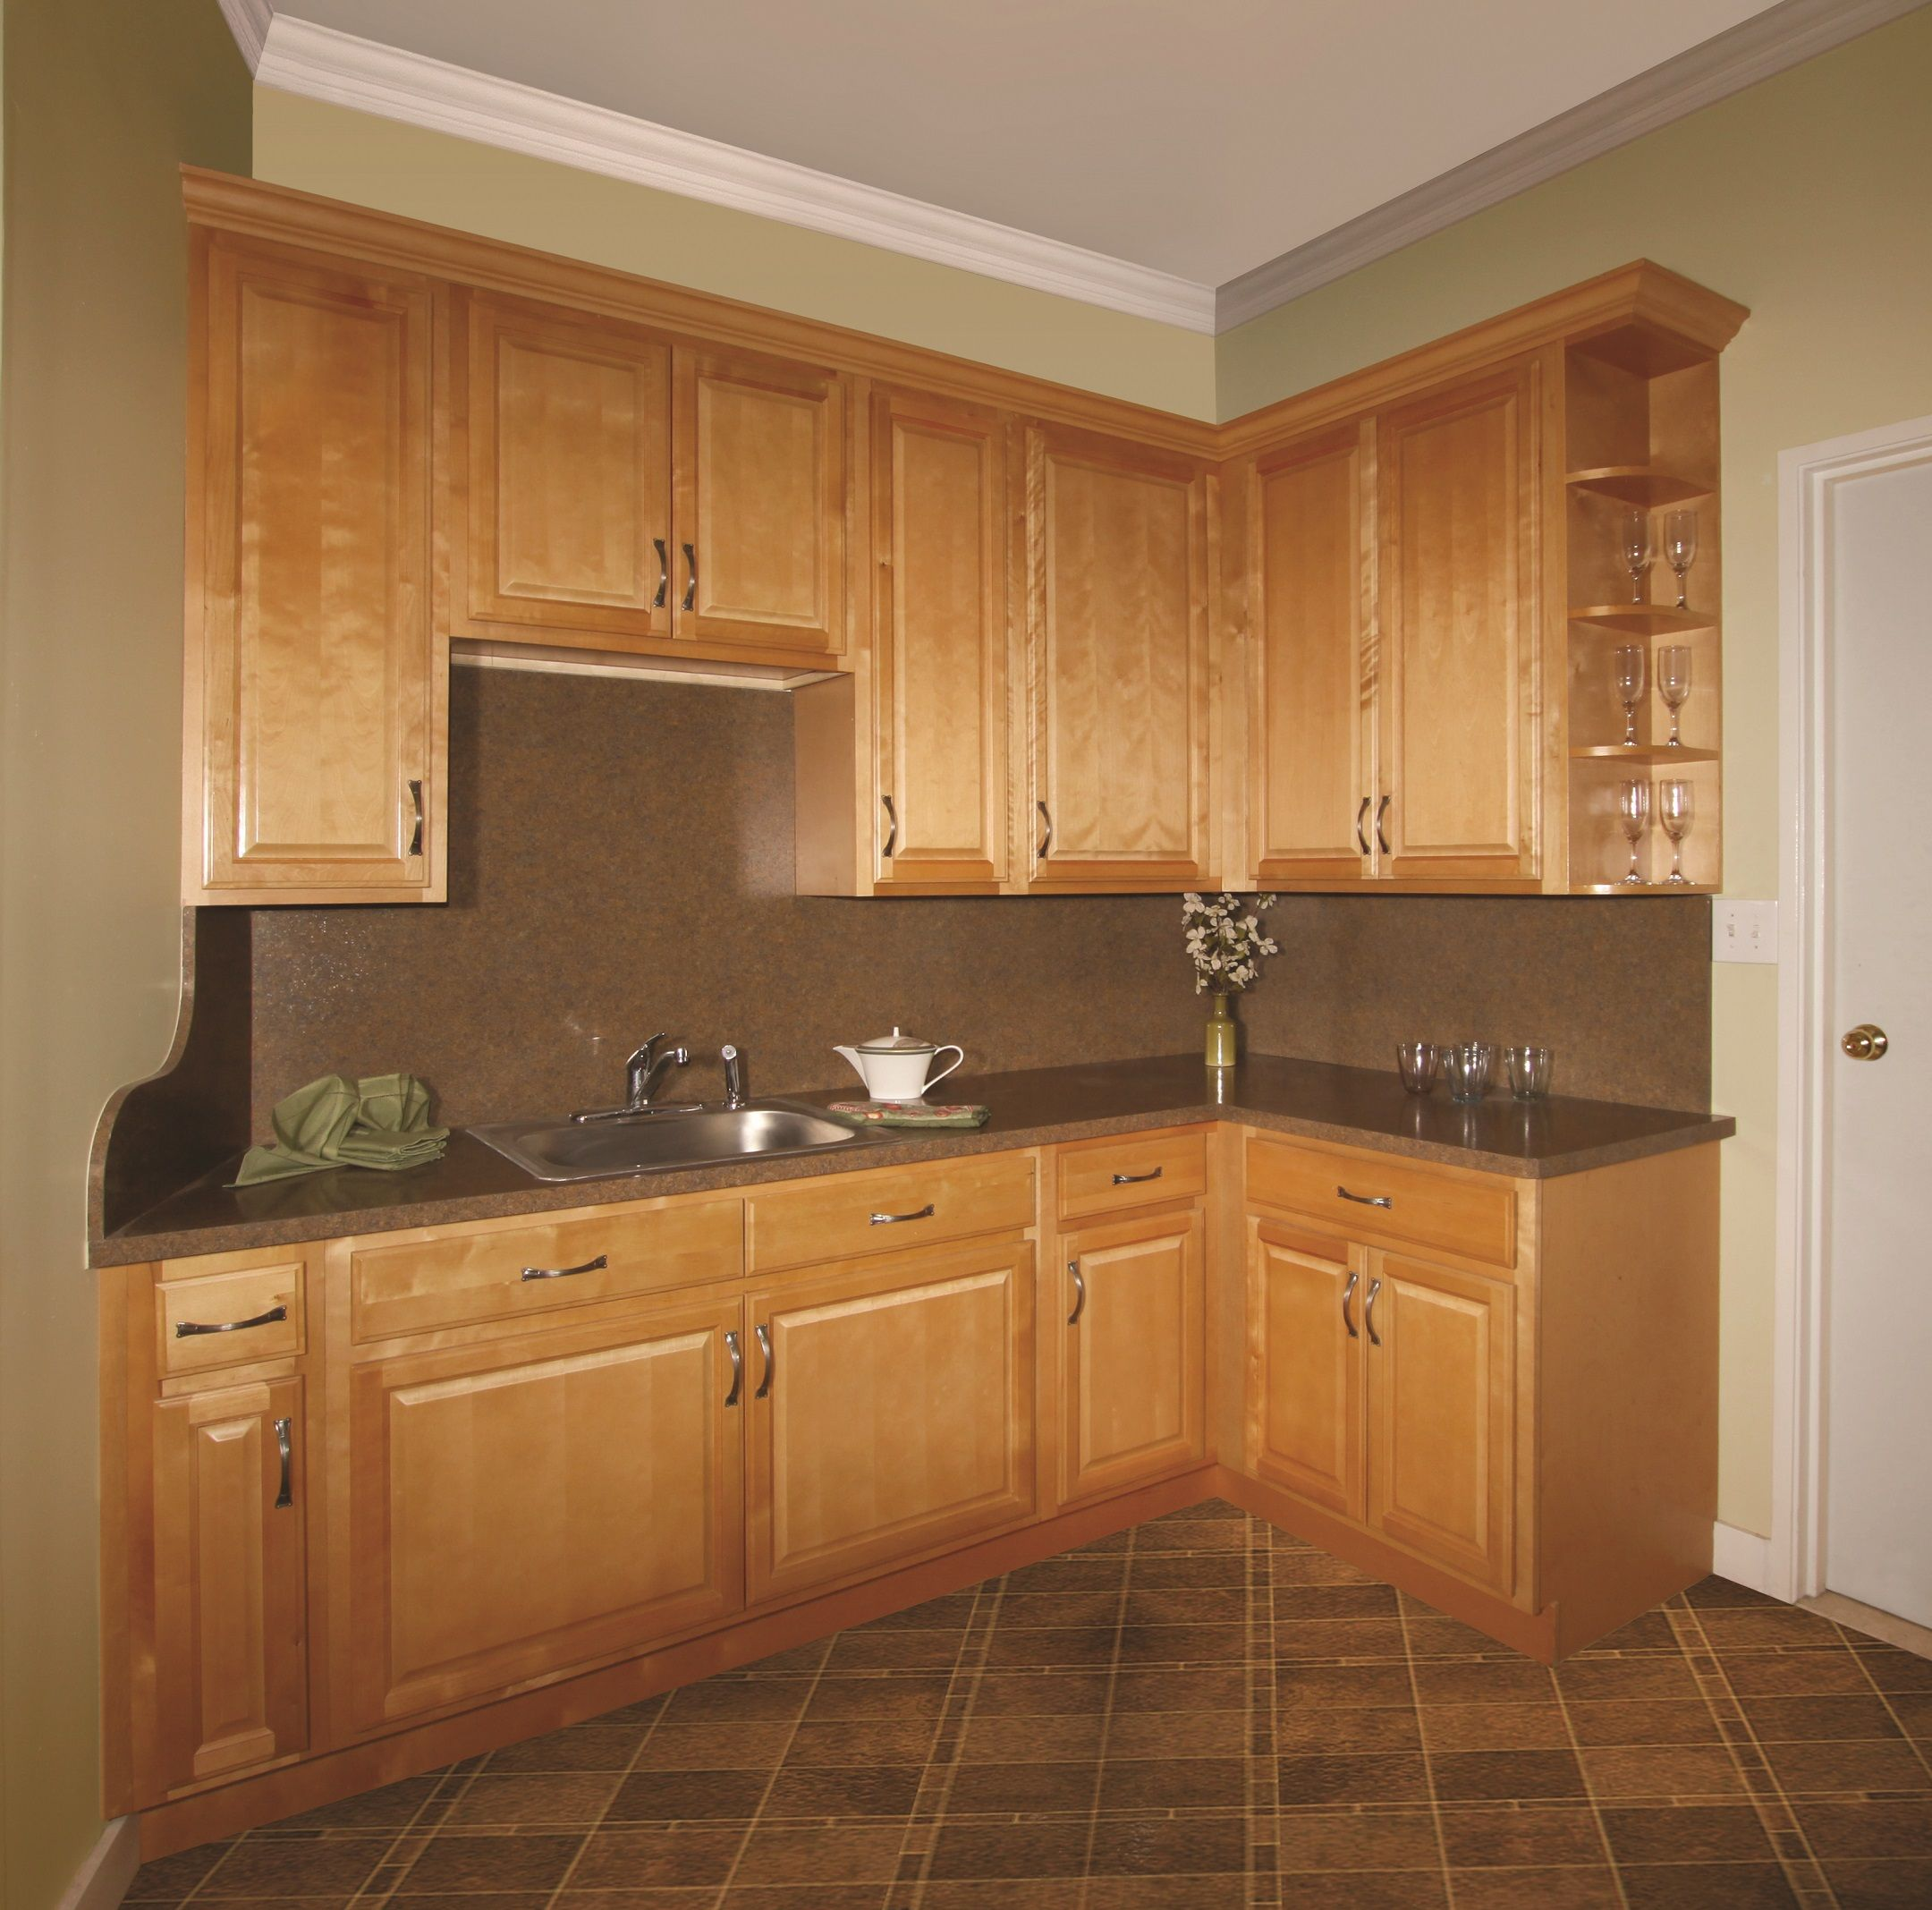 Landmark Natural Kitchen Vanity Kitchen Cabinets Kitchen Remodel Discount Kitchen Cabinets